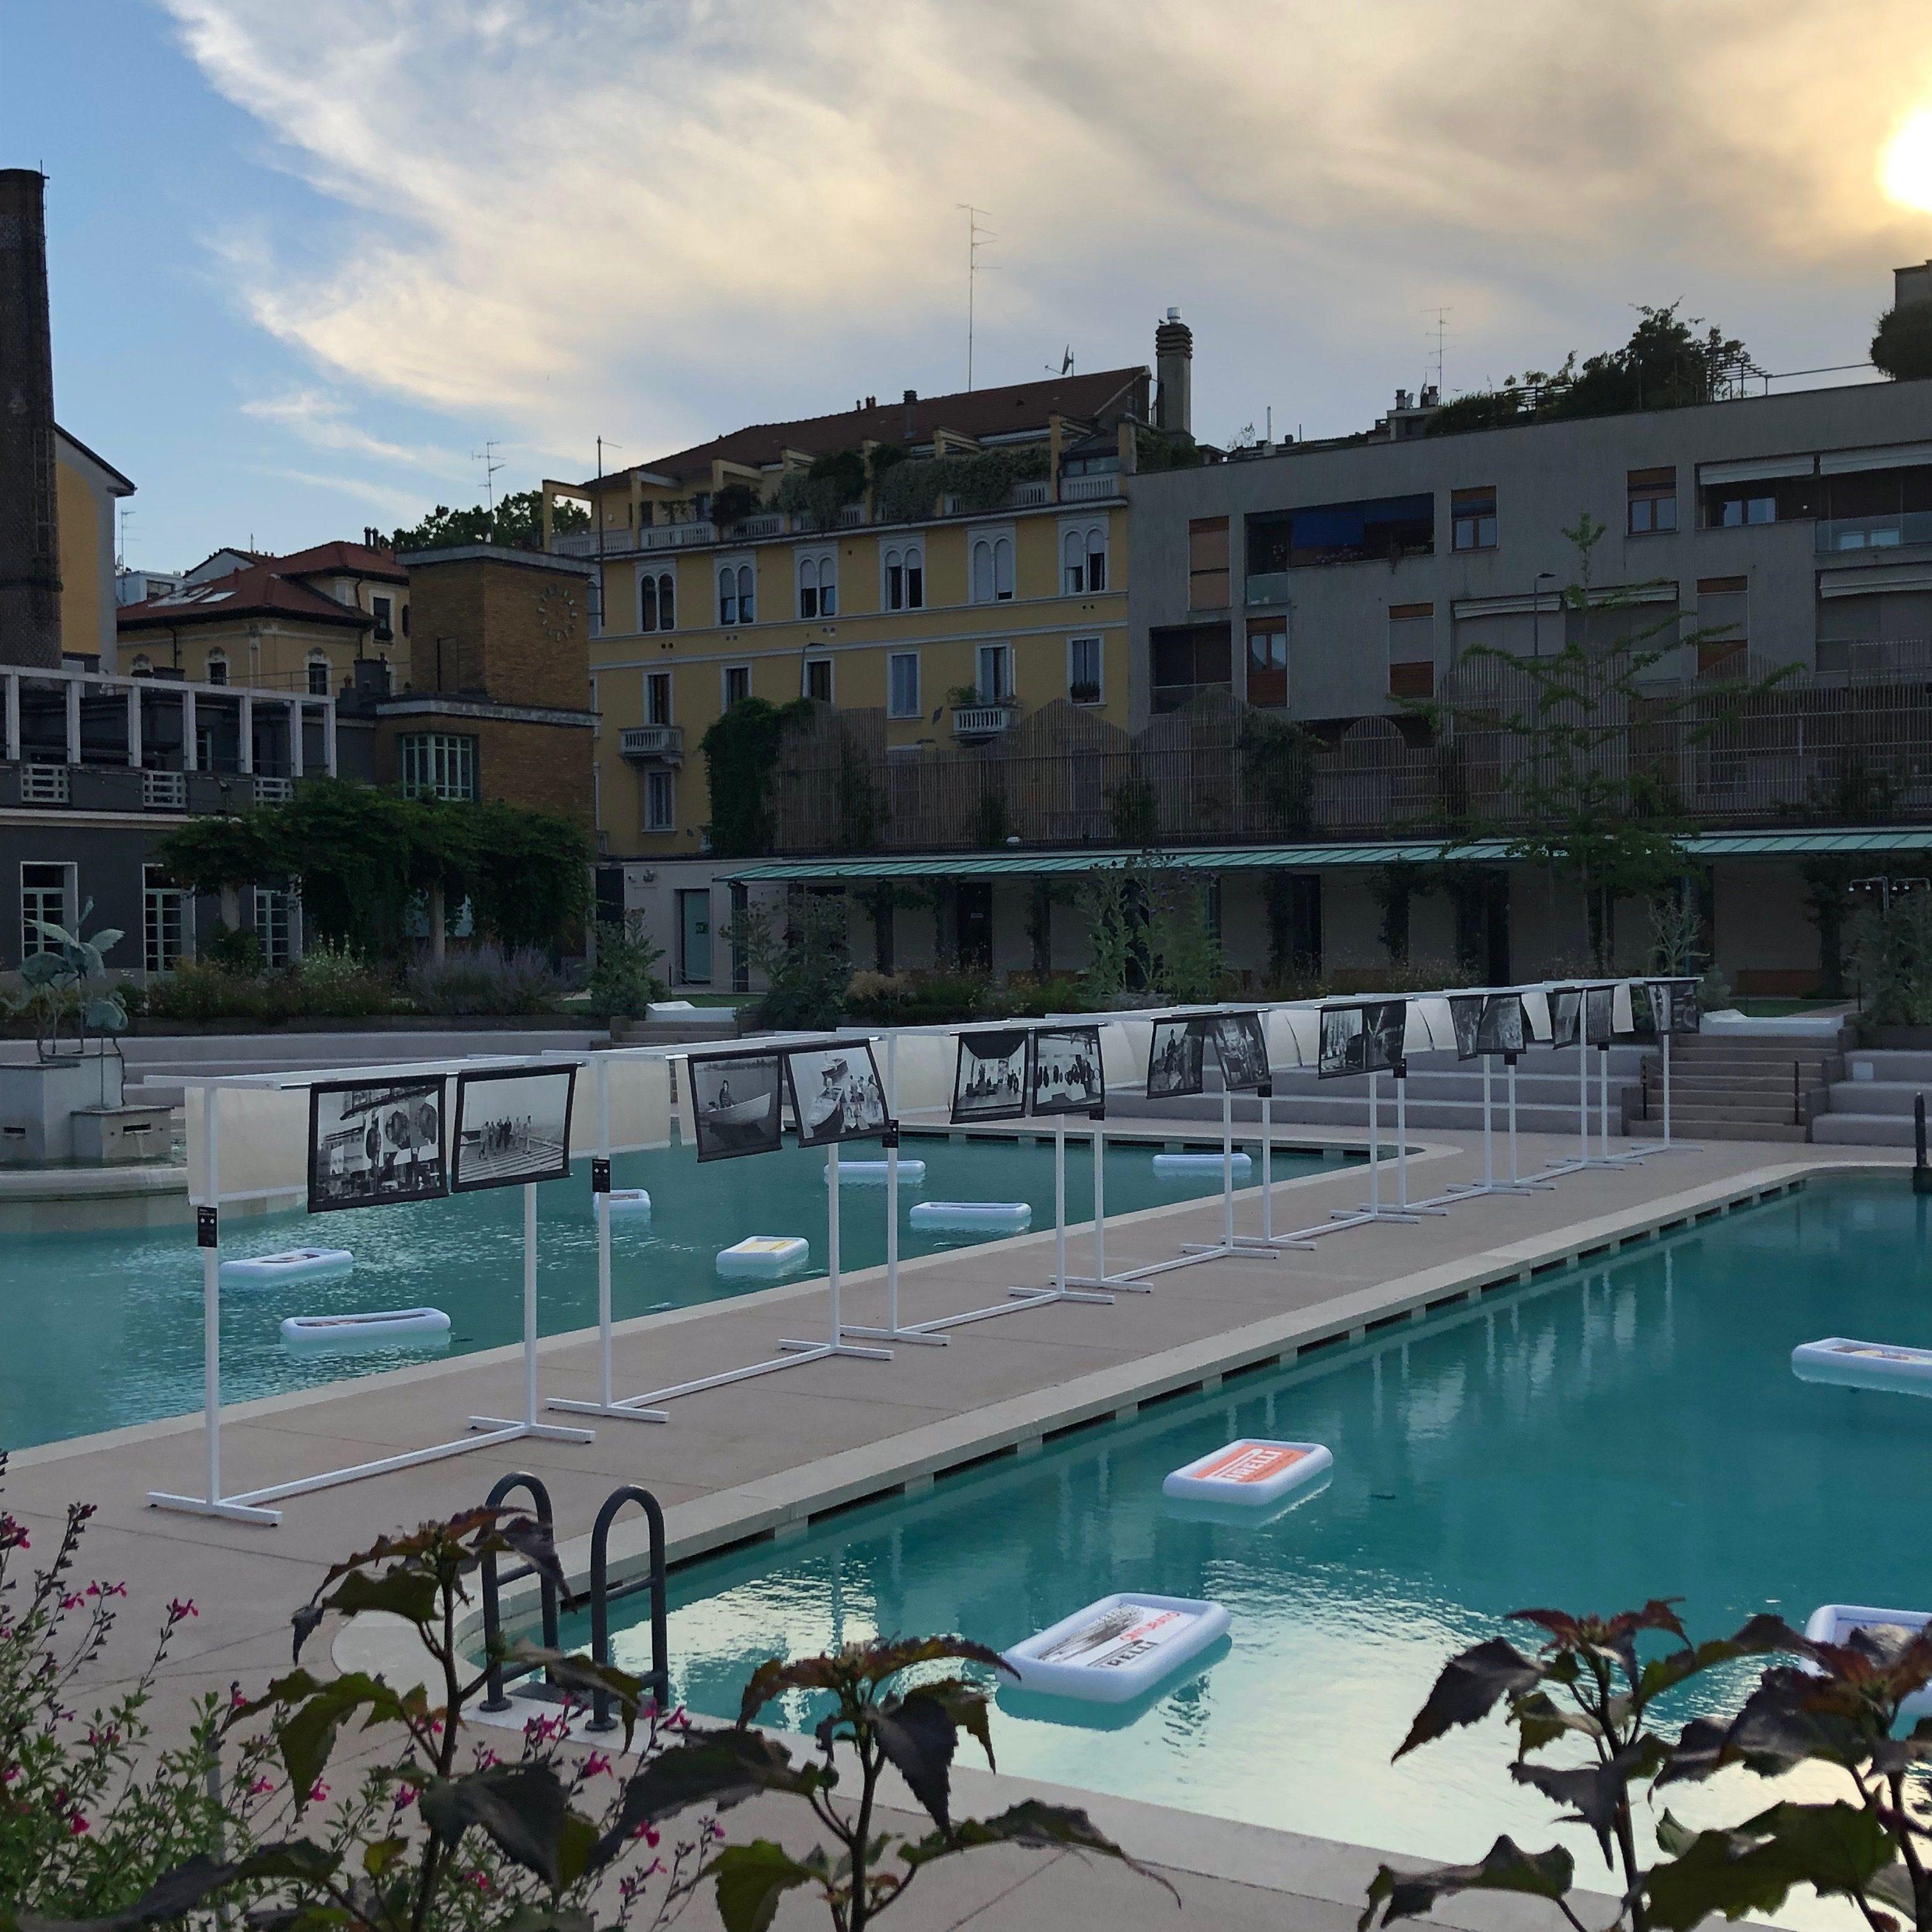 2019, Pirelli, Teatro Parenti Milano, Presentazione Volume Umanesimo Industriale